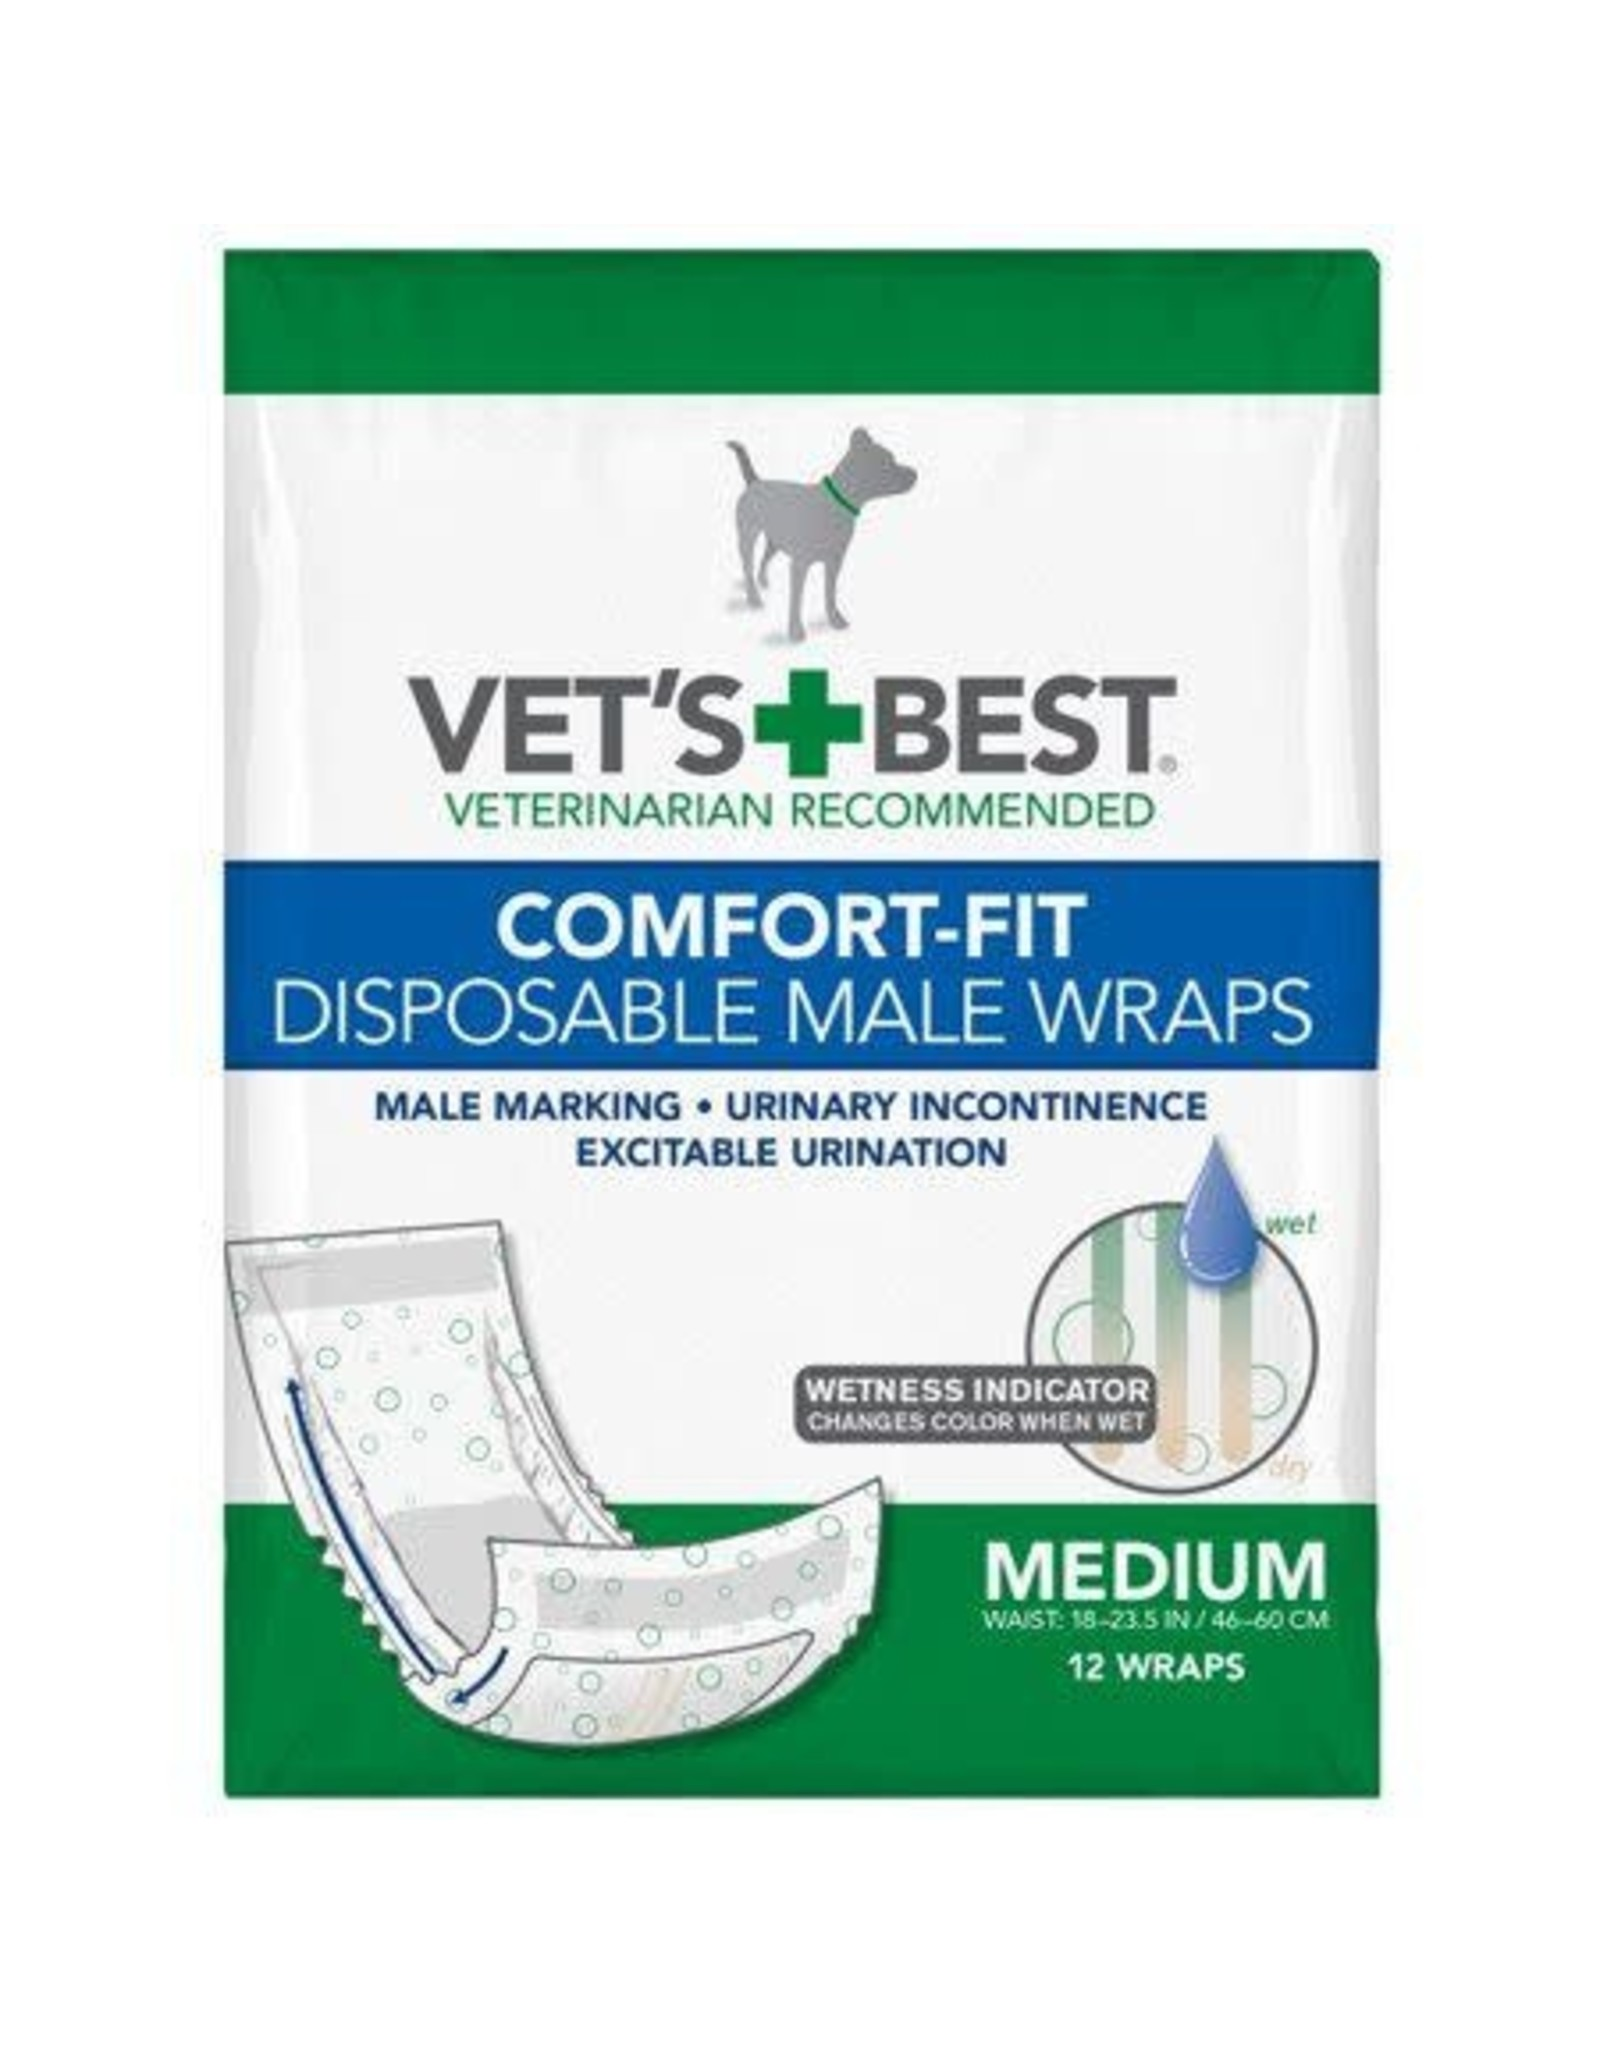 vets's best Vets best medium dog diaper disposable